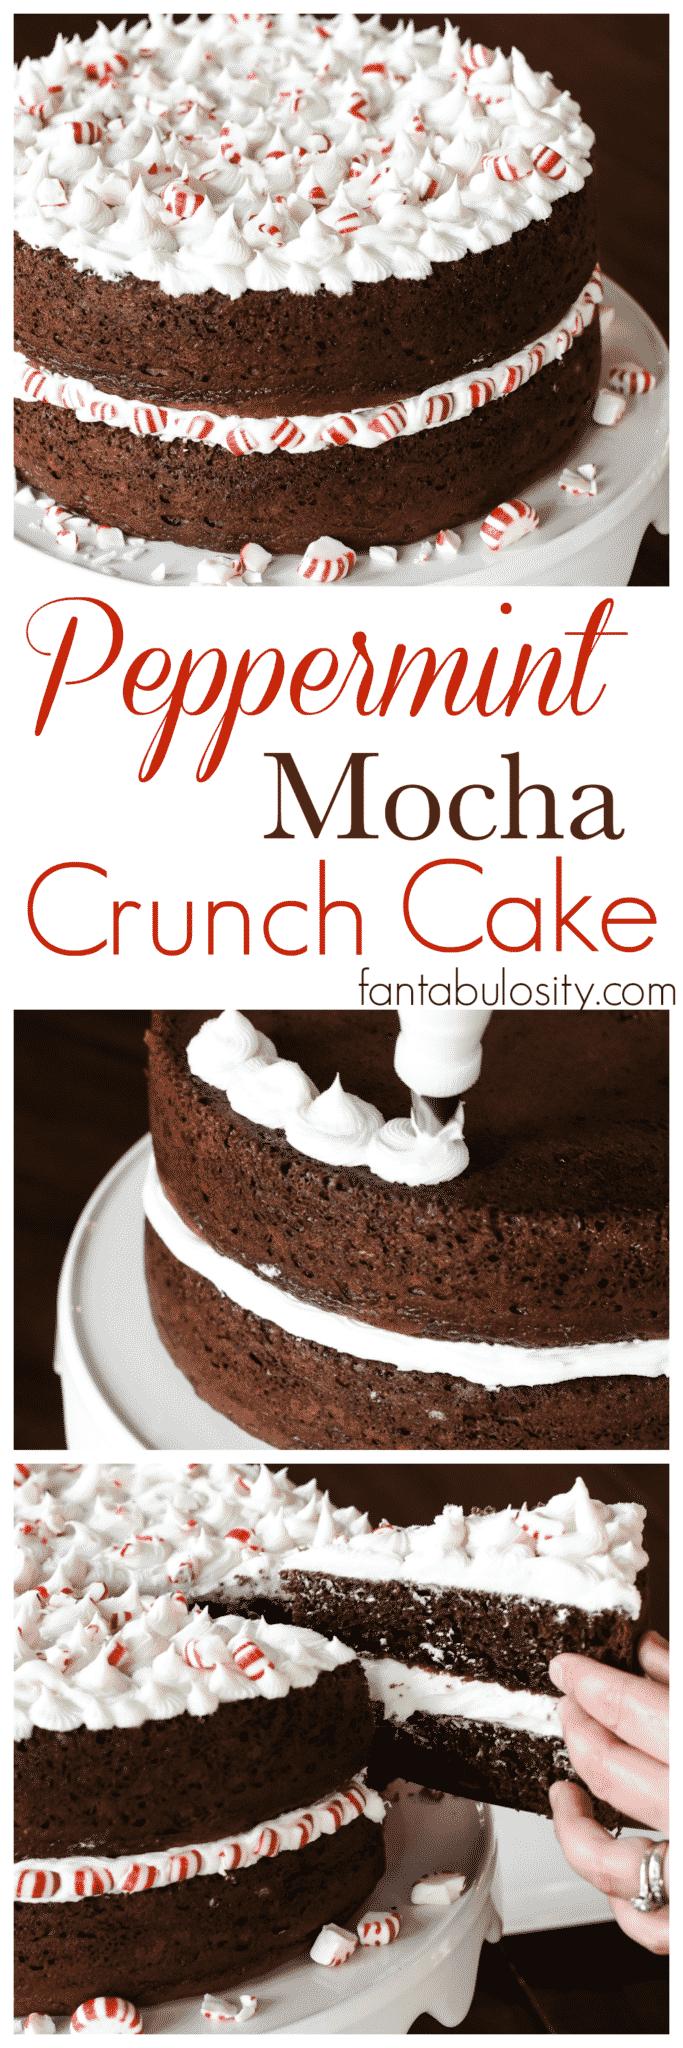 Peppermint Mocha Crunch Cake Recipe